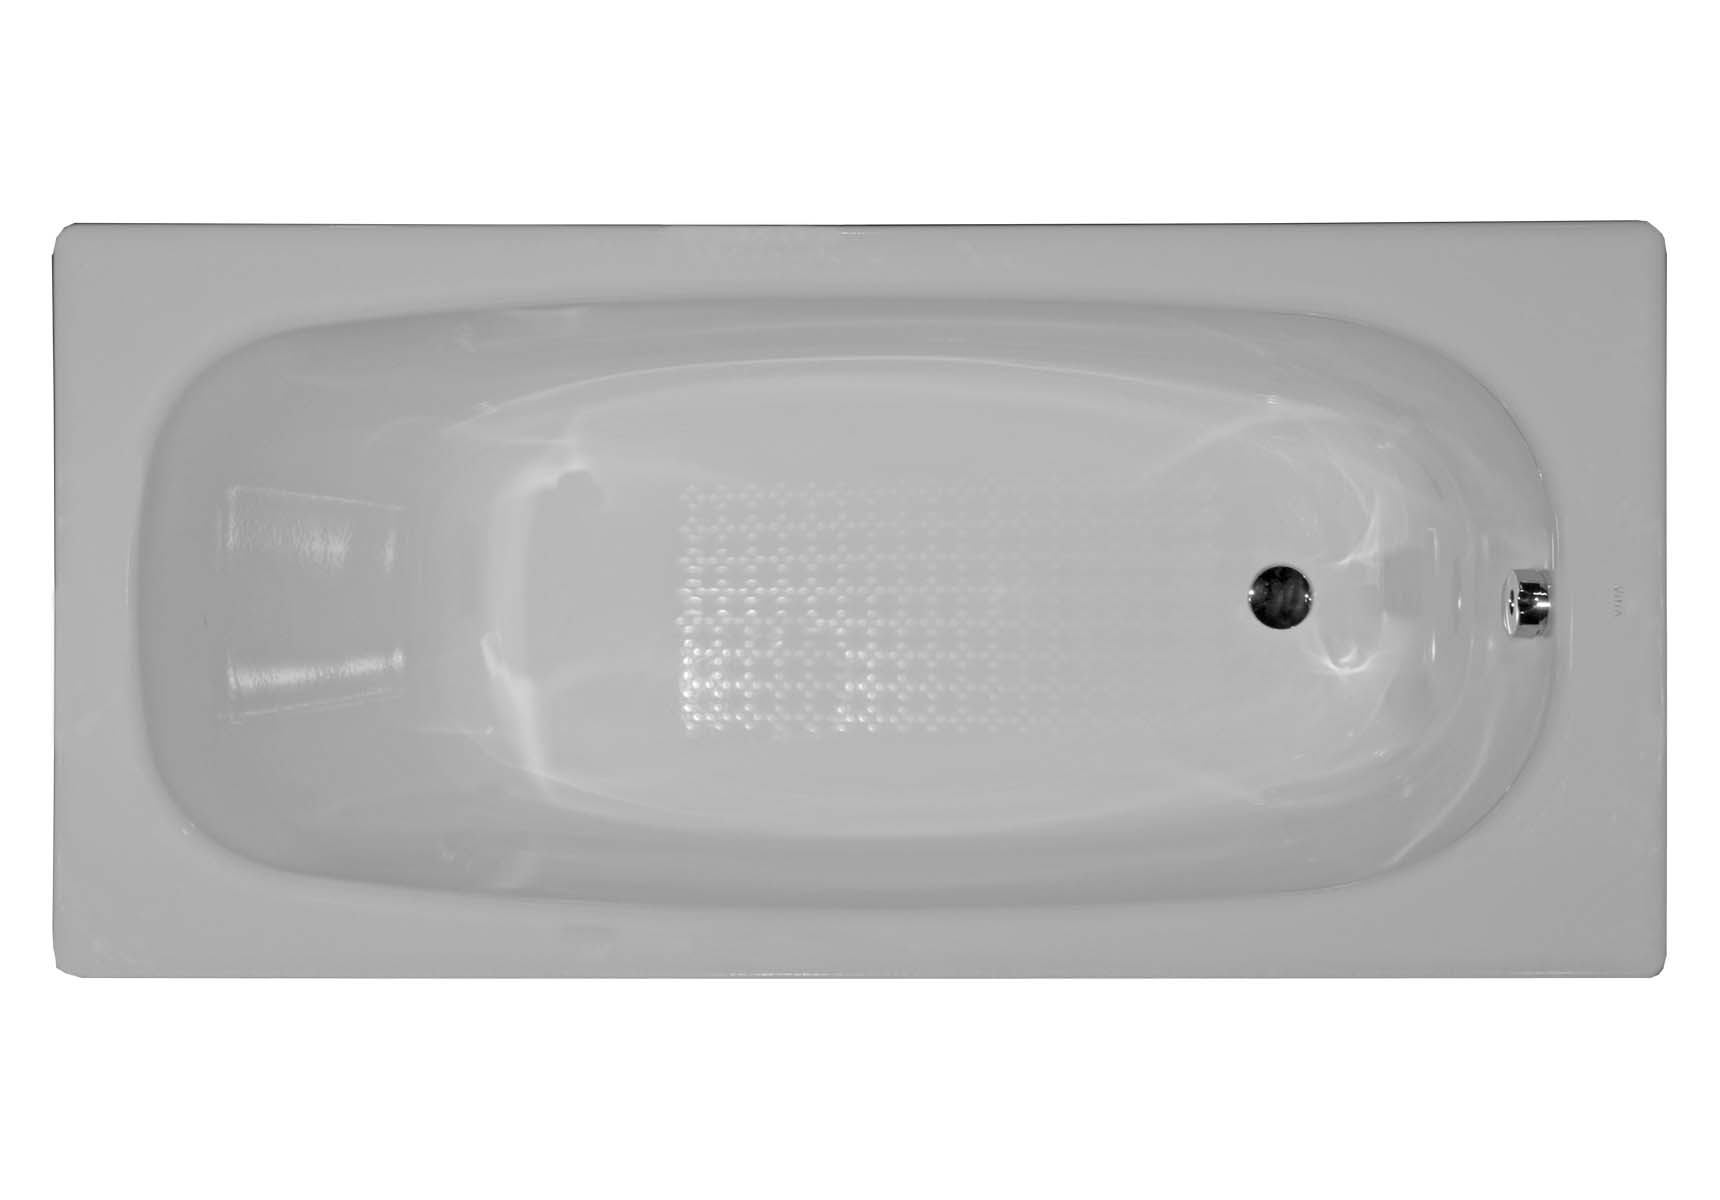 Generic 160x70 cm Steel Bathtub, 2.2 Mm, Normal Depth